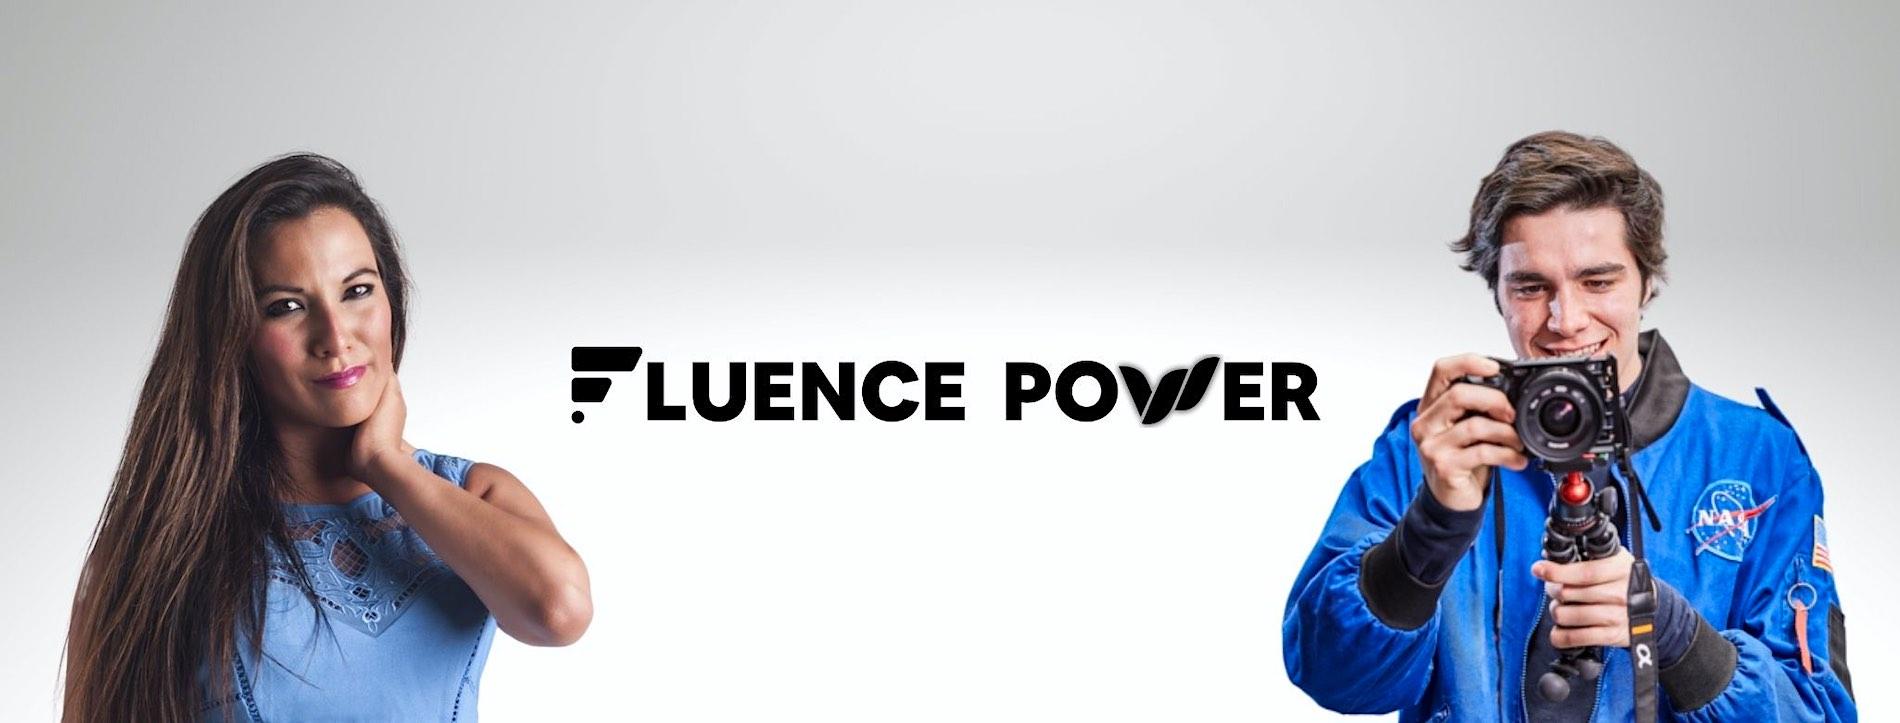 La empresa de marketing digital Fluence Leaders y Coaching Power crean Fluence Power, la primera agencia de marketing digital corporativo especializada en LinkedIn.